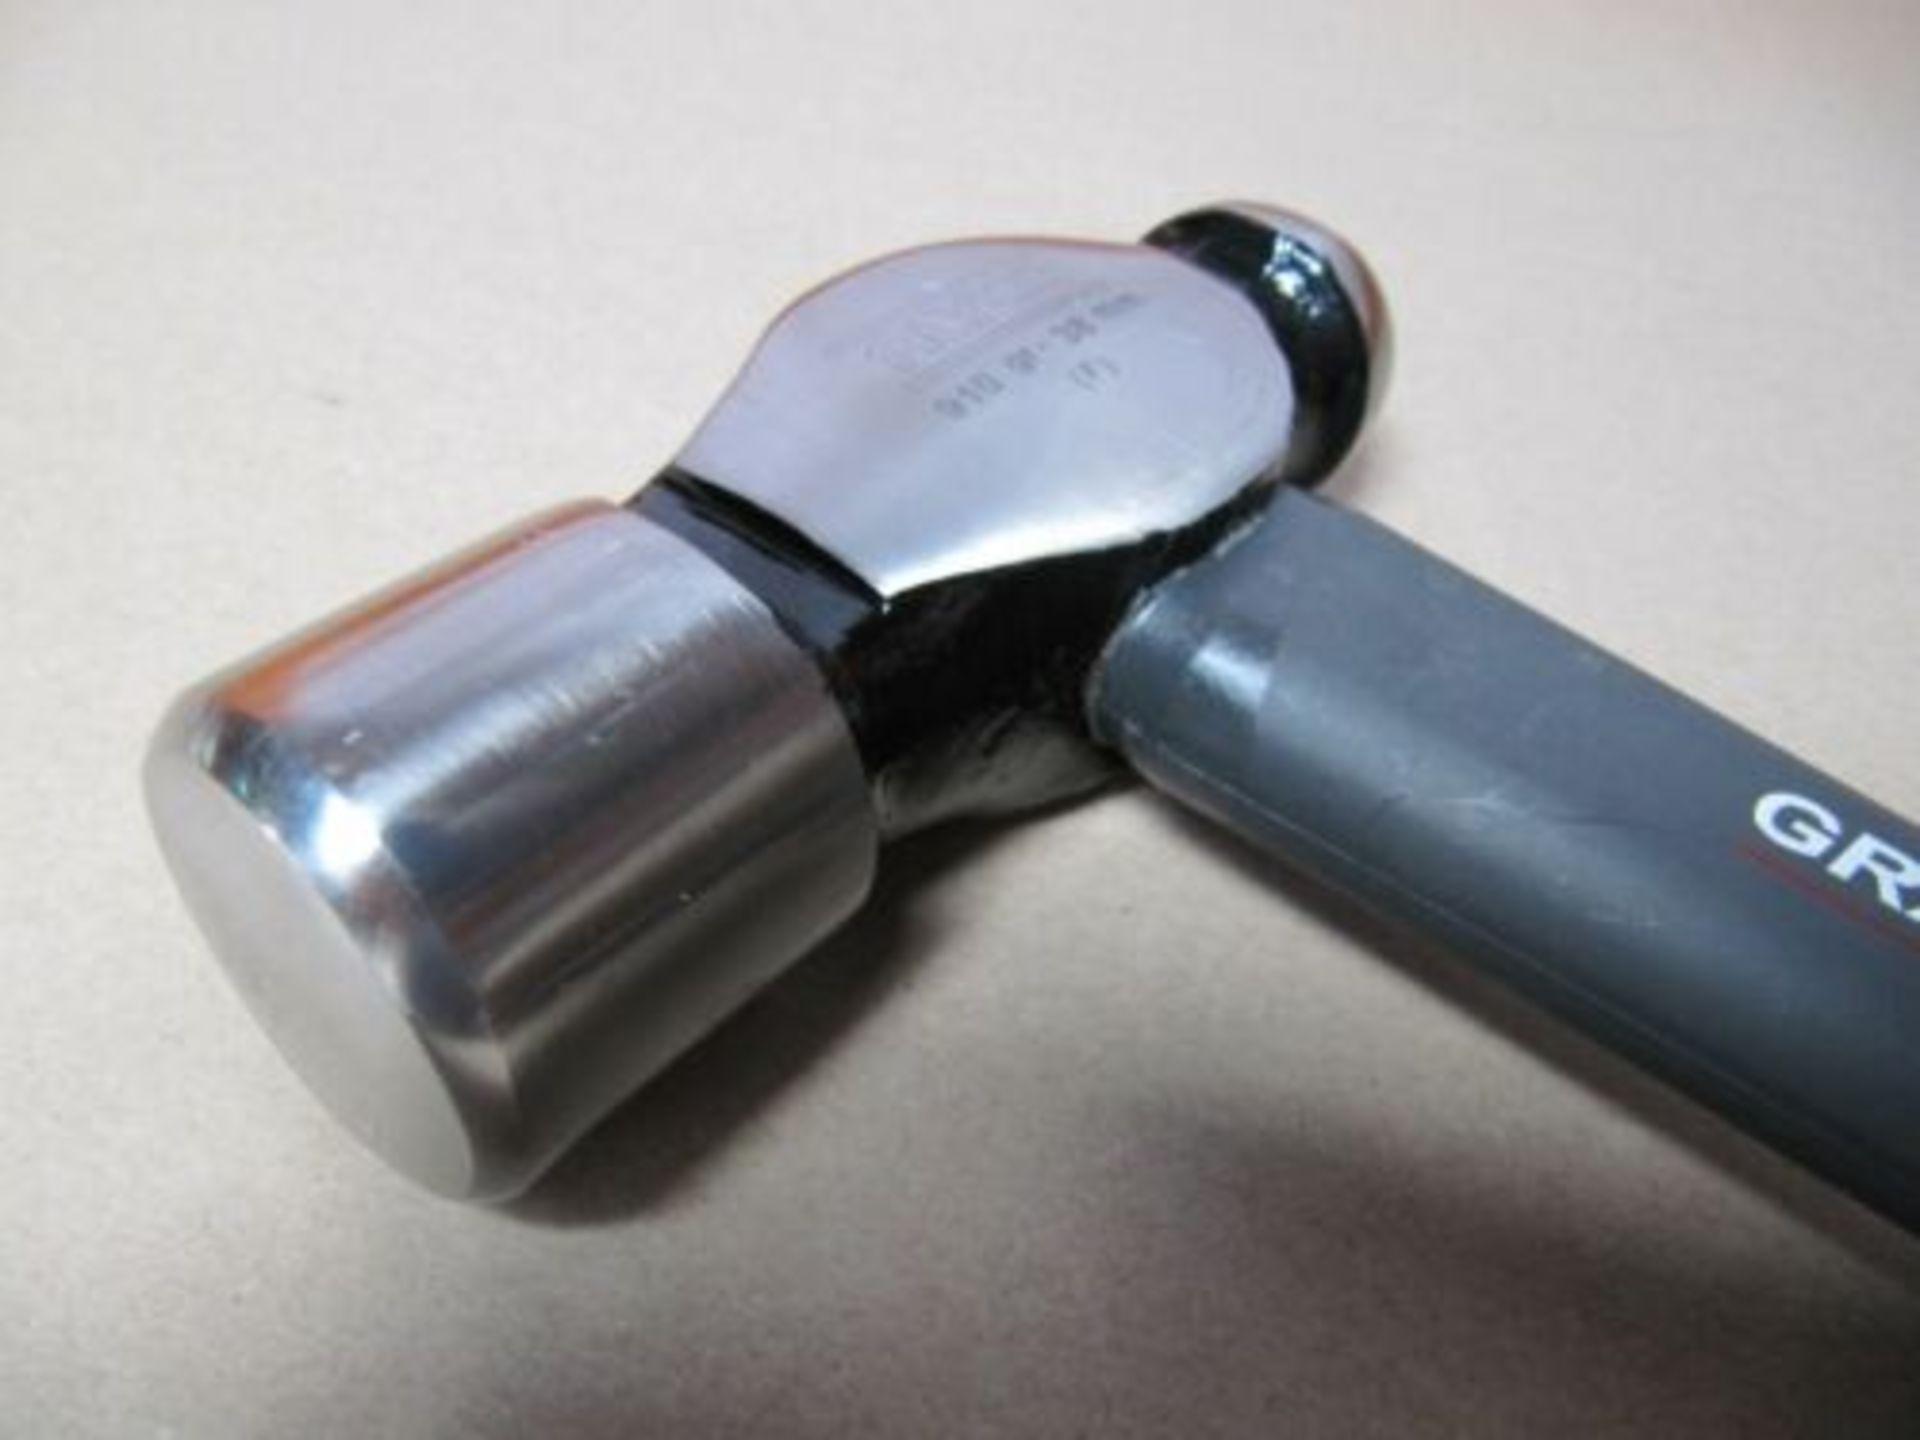 Lot 30 - 5 x Ball Pein Hammer. Fibreglass Shaft. Grafito. 910g, 38mmno vat on hammer.You will get 5 of